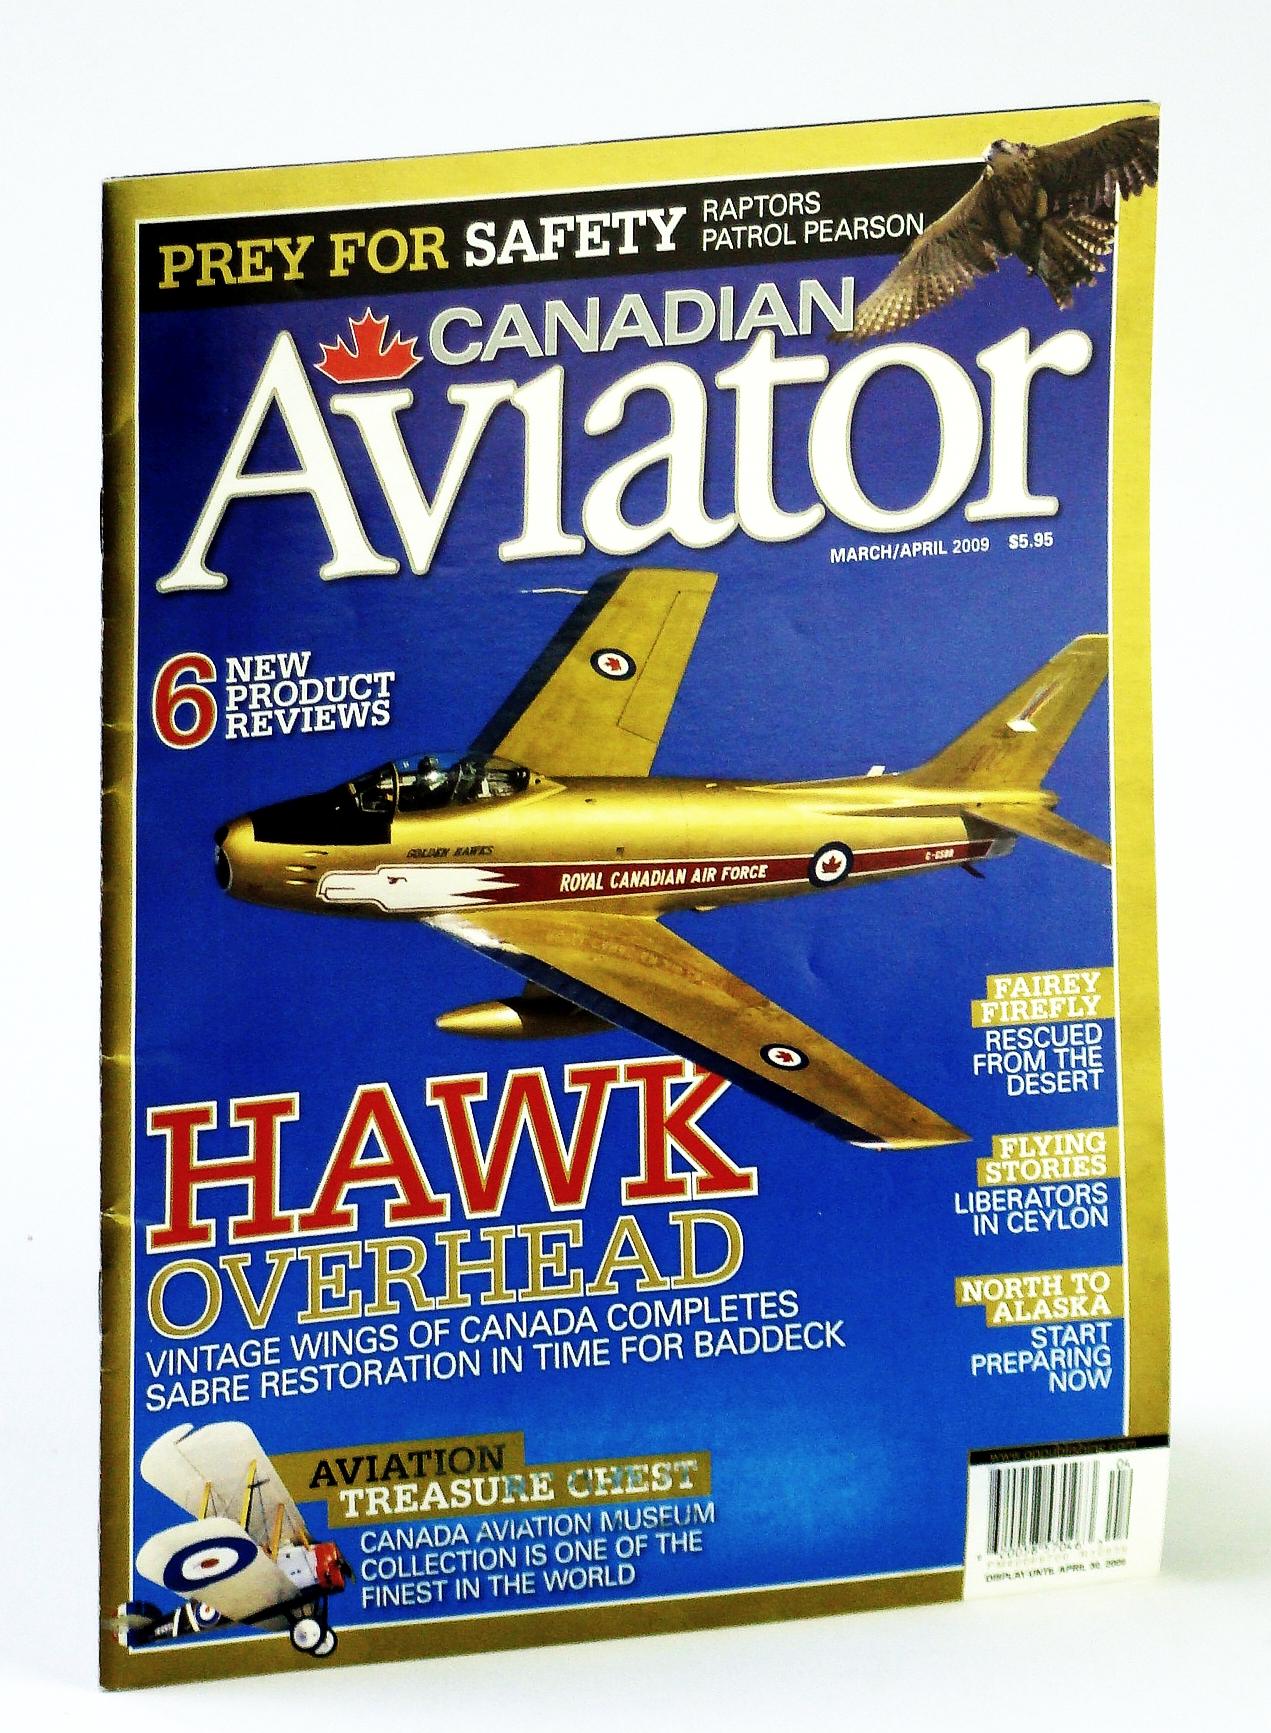 Image for Canadian Aviator Magazine, March / April 2009 - Sabre Restoration